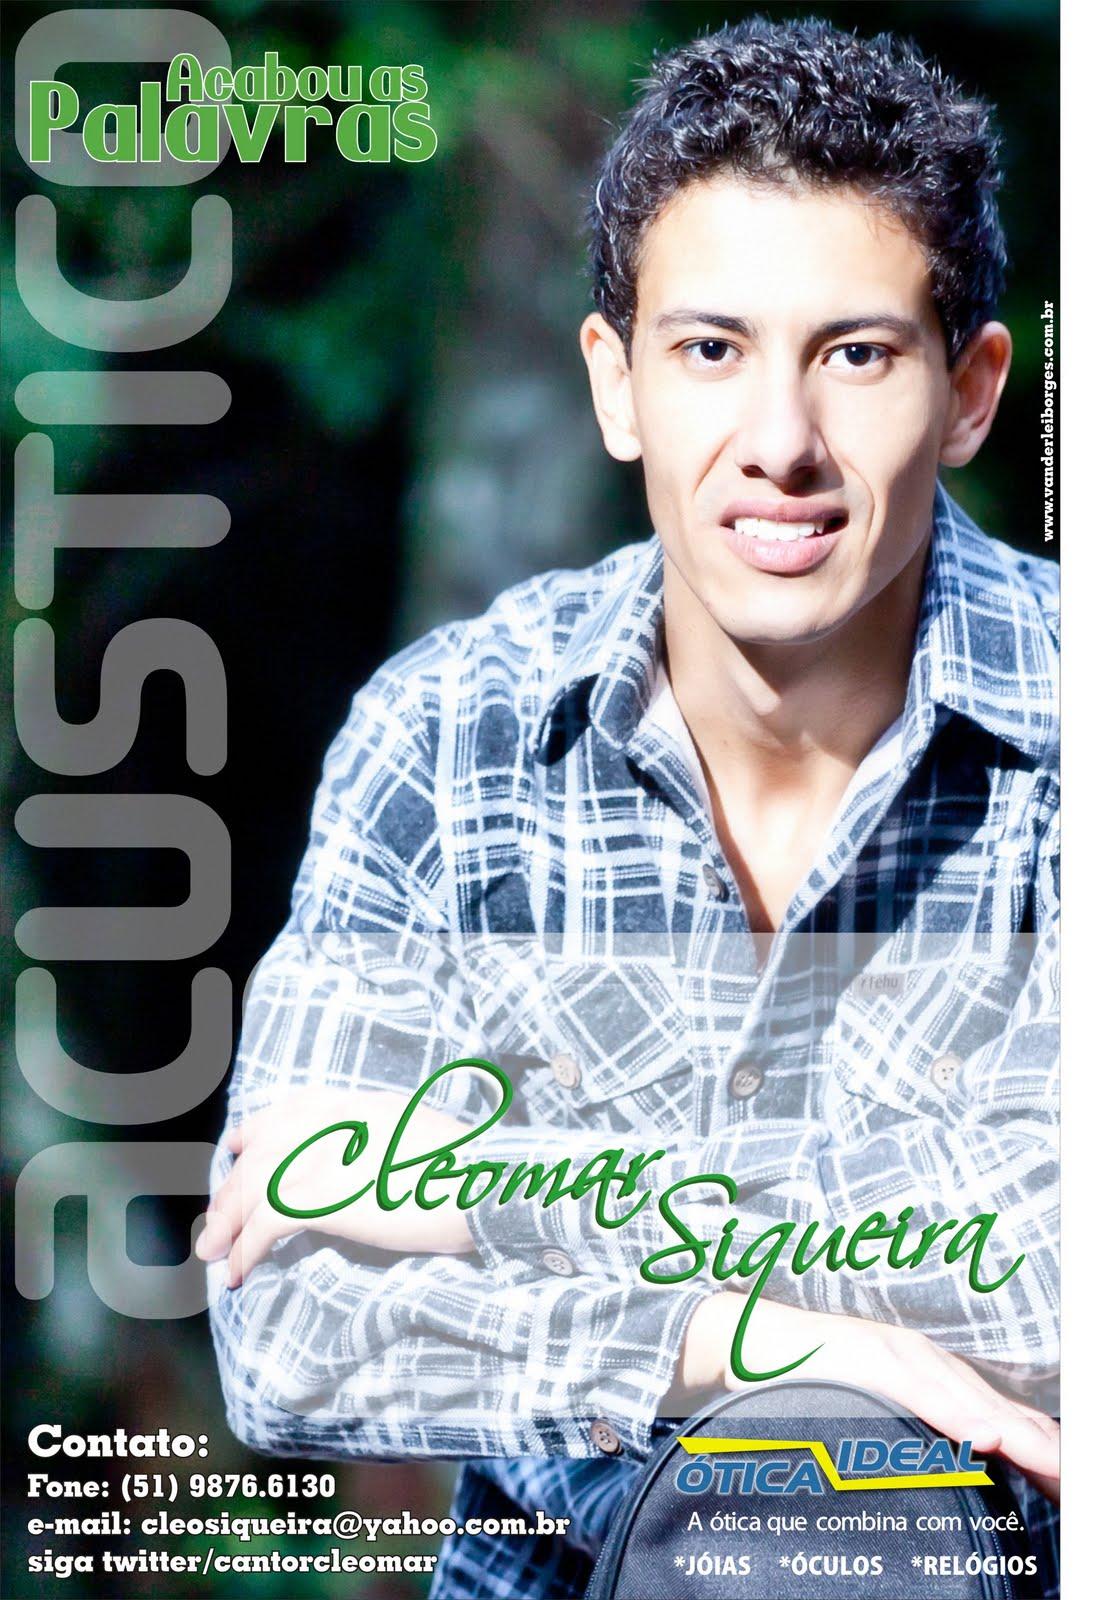 Cantor  Cleomar  Siqueira